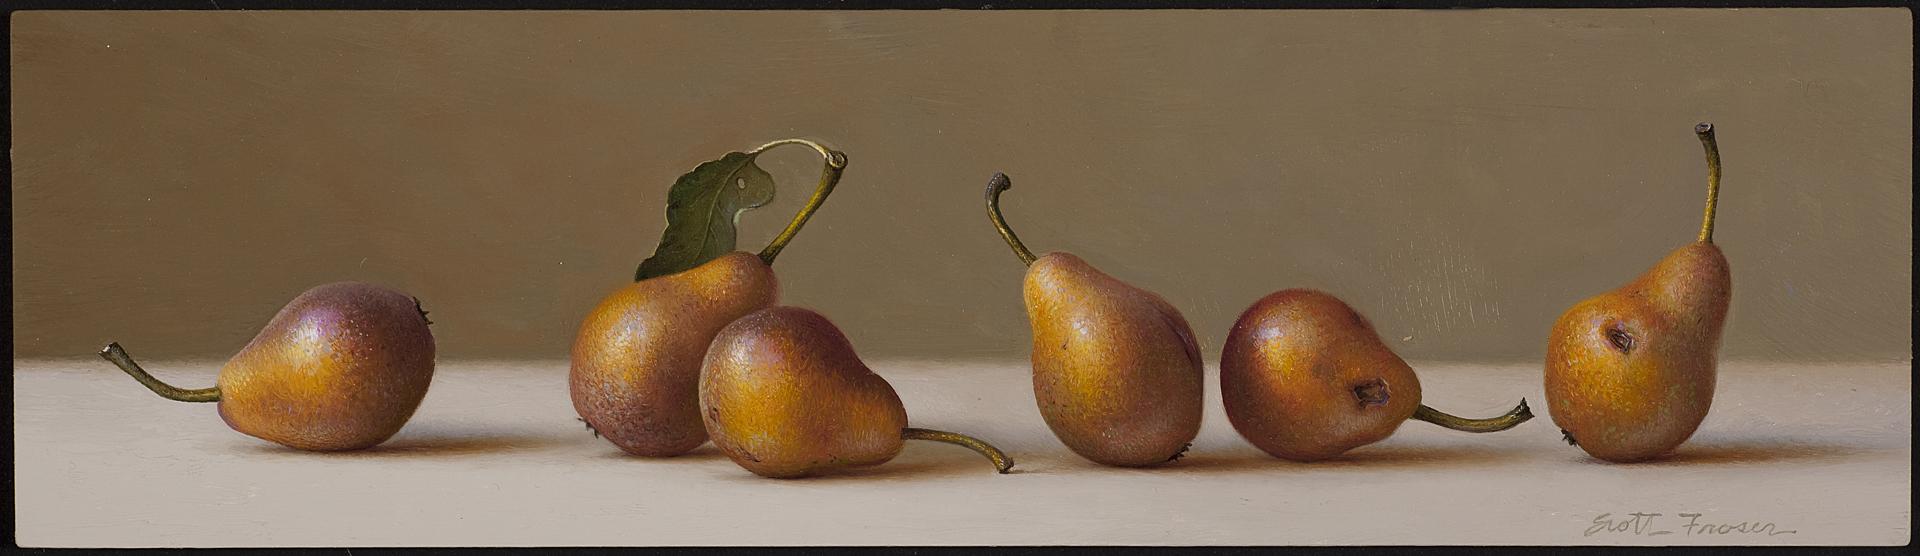 Six Pears by Scott Fraser